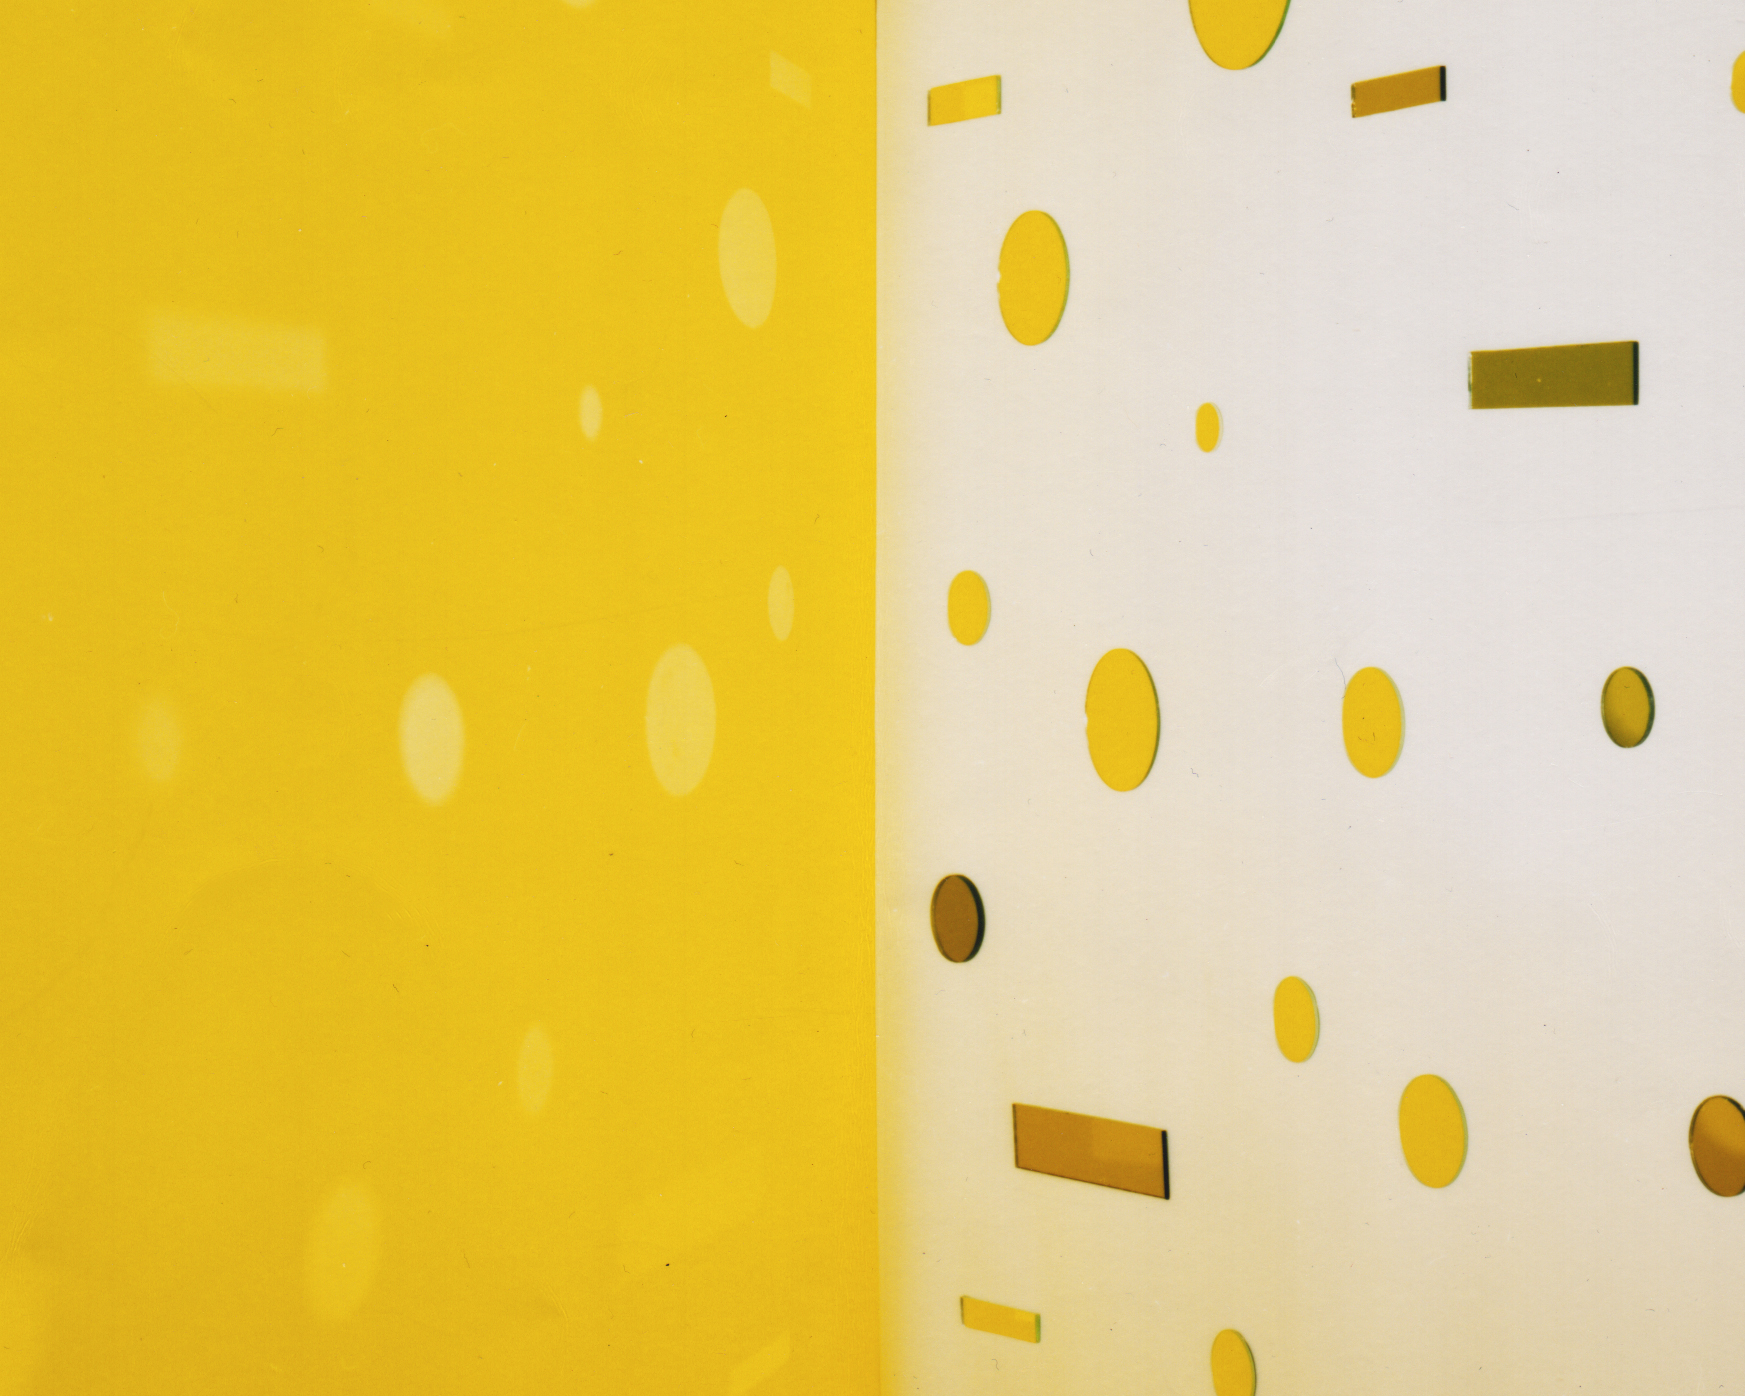 JACKY REDGATE   Light Throw (Mirrors) Fold - Yellow  2016 chromogenic photograph (handprinted Sandyprints) 104 x 130 cm